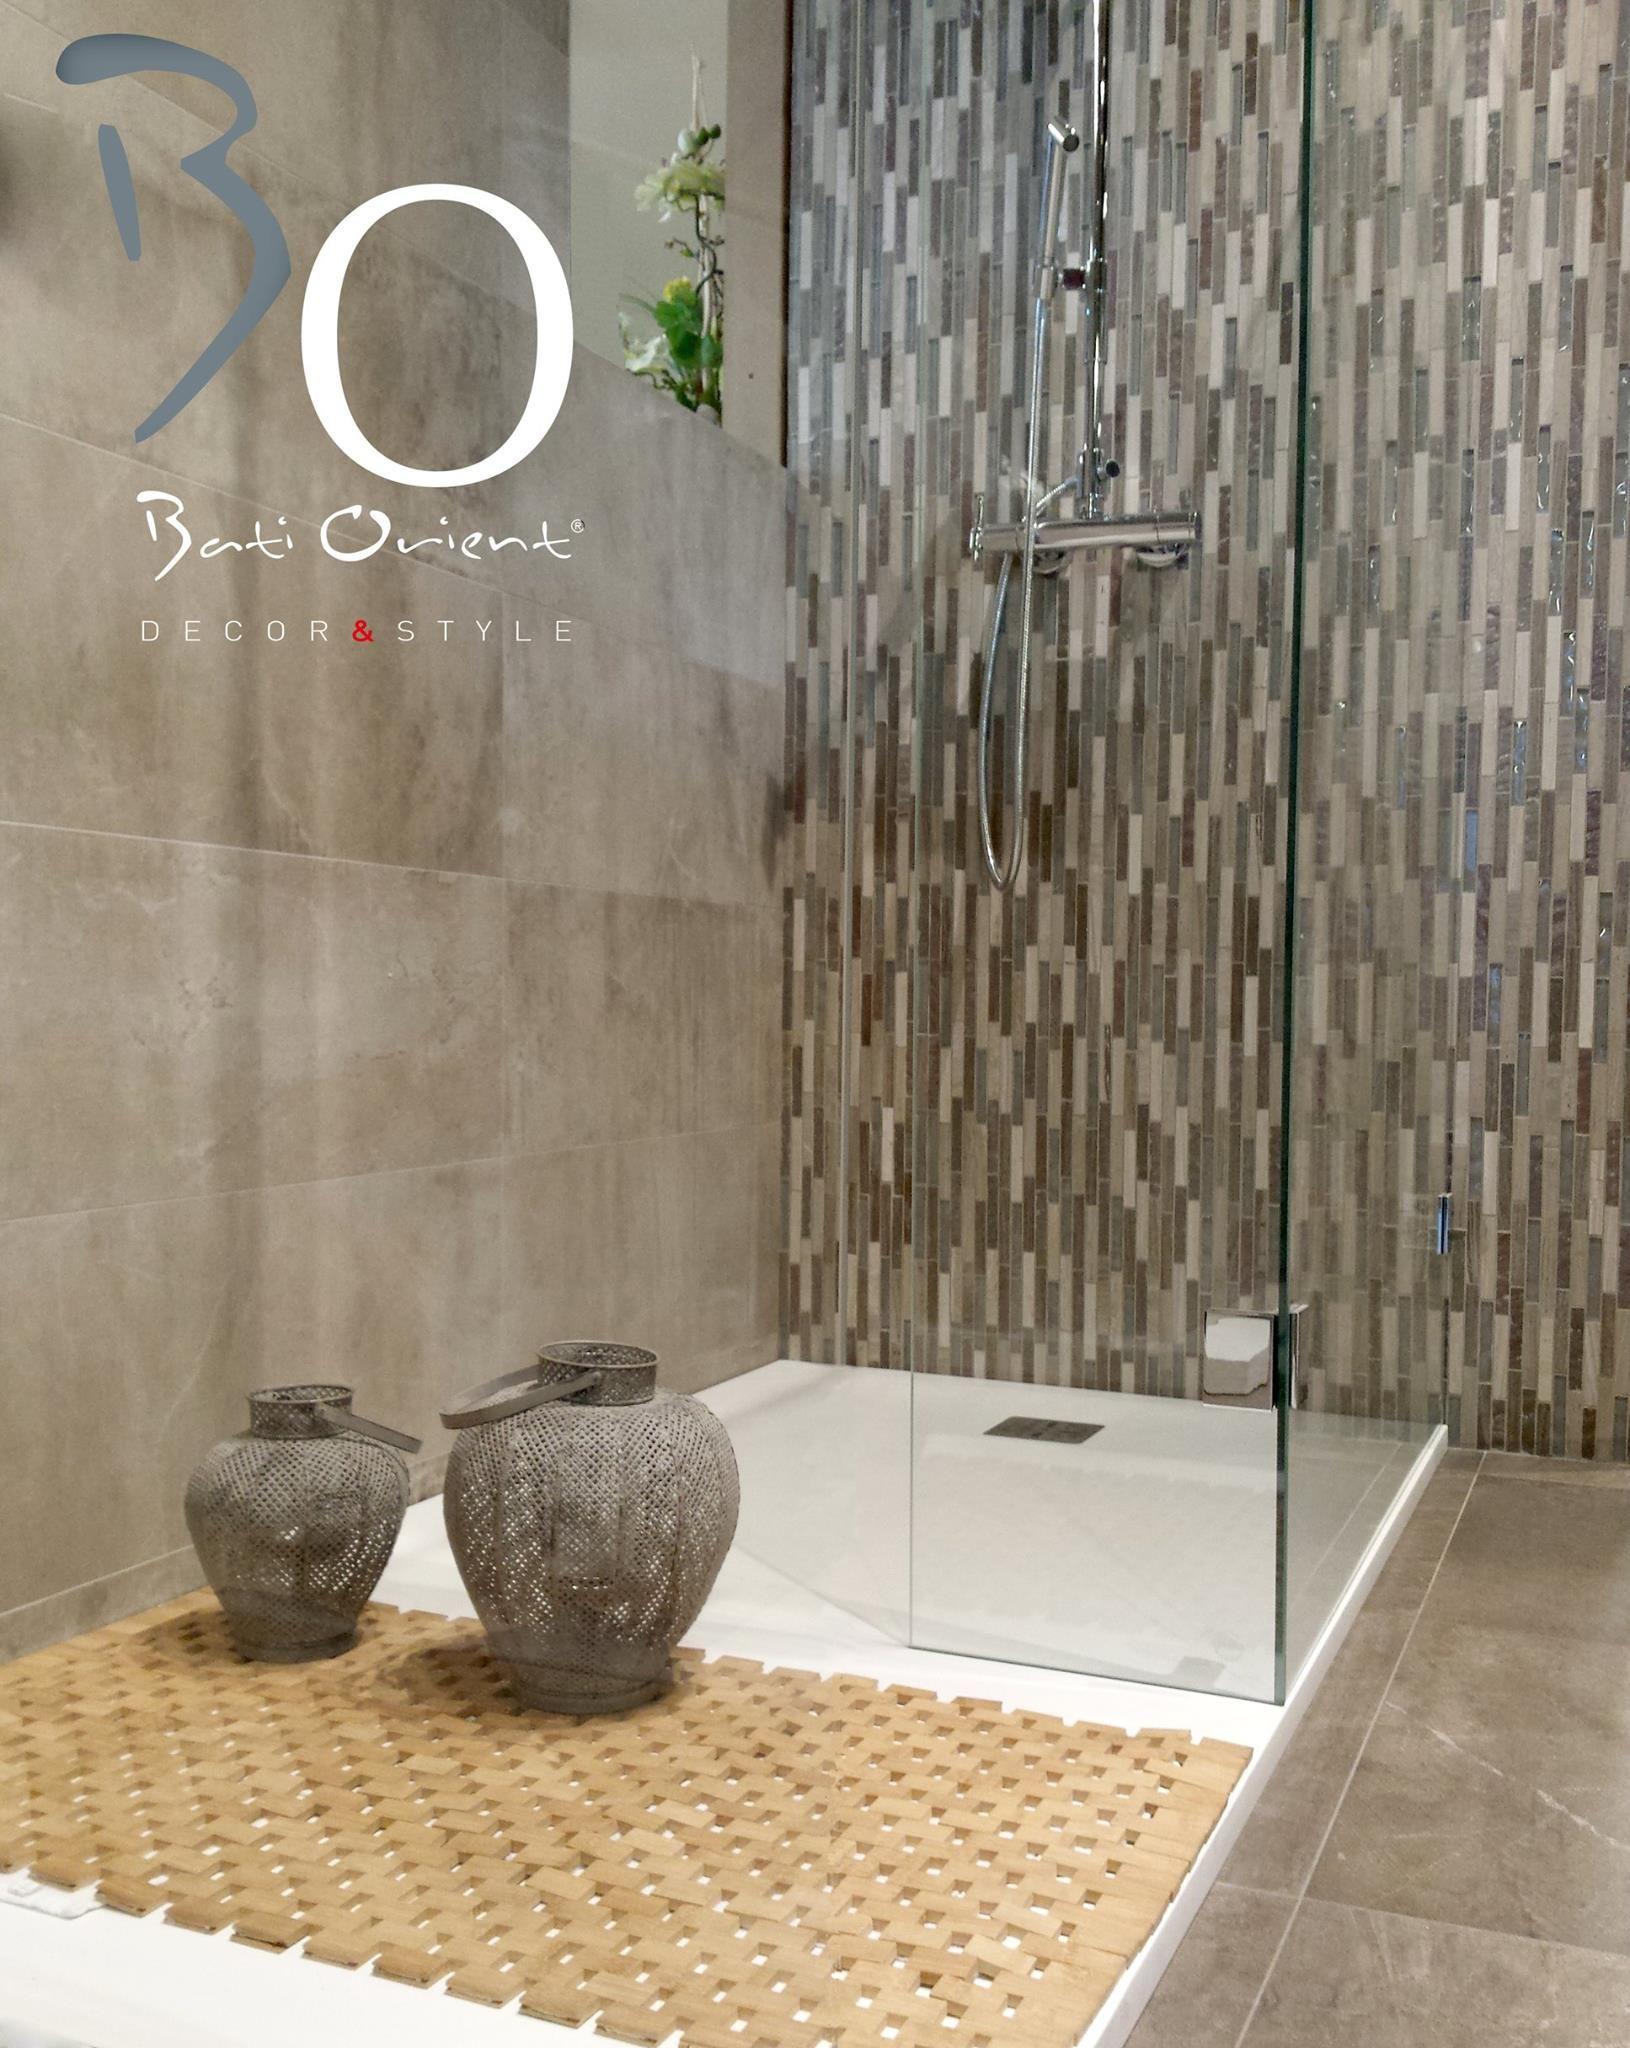 fond de mur de douche r aliser avec la mosa que bati orient compos e de barrette de marbre de. Black Bedroom Furniture Sets. Home Design Ideas